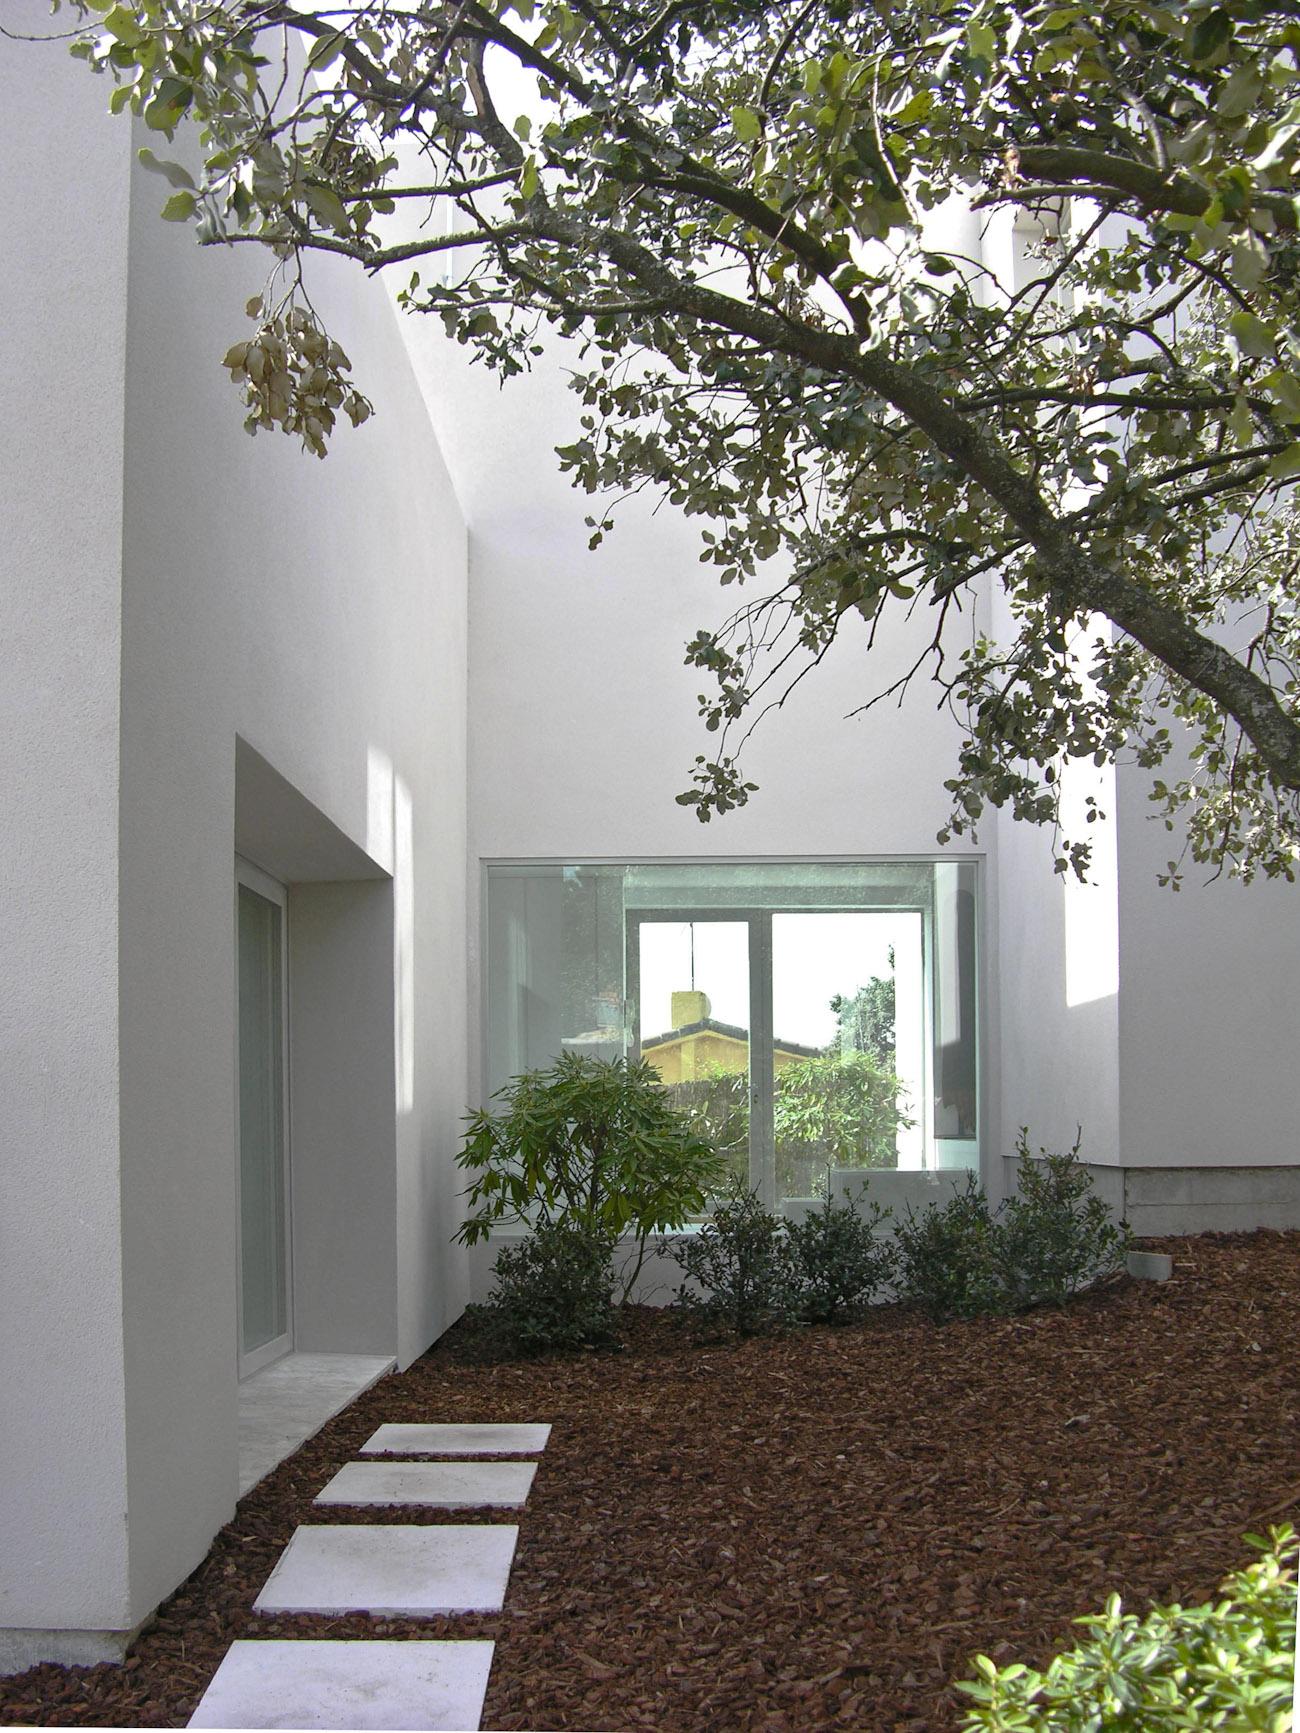 detalle del jardín de una vivienda aislada estudio ÁBATON